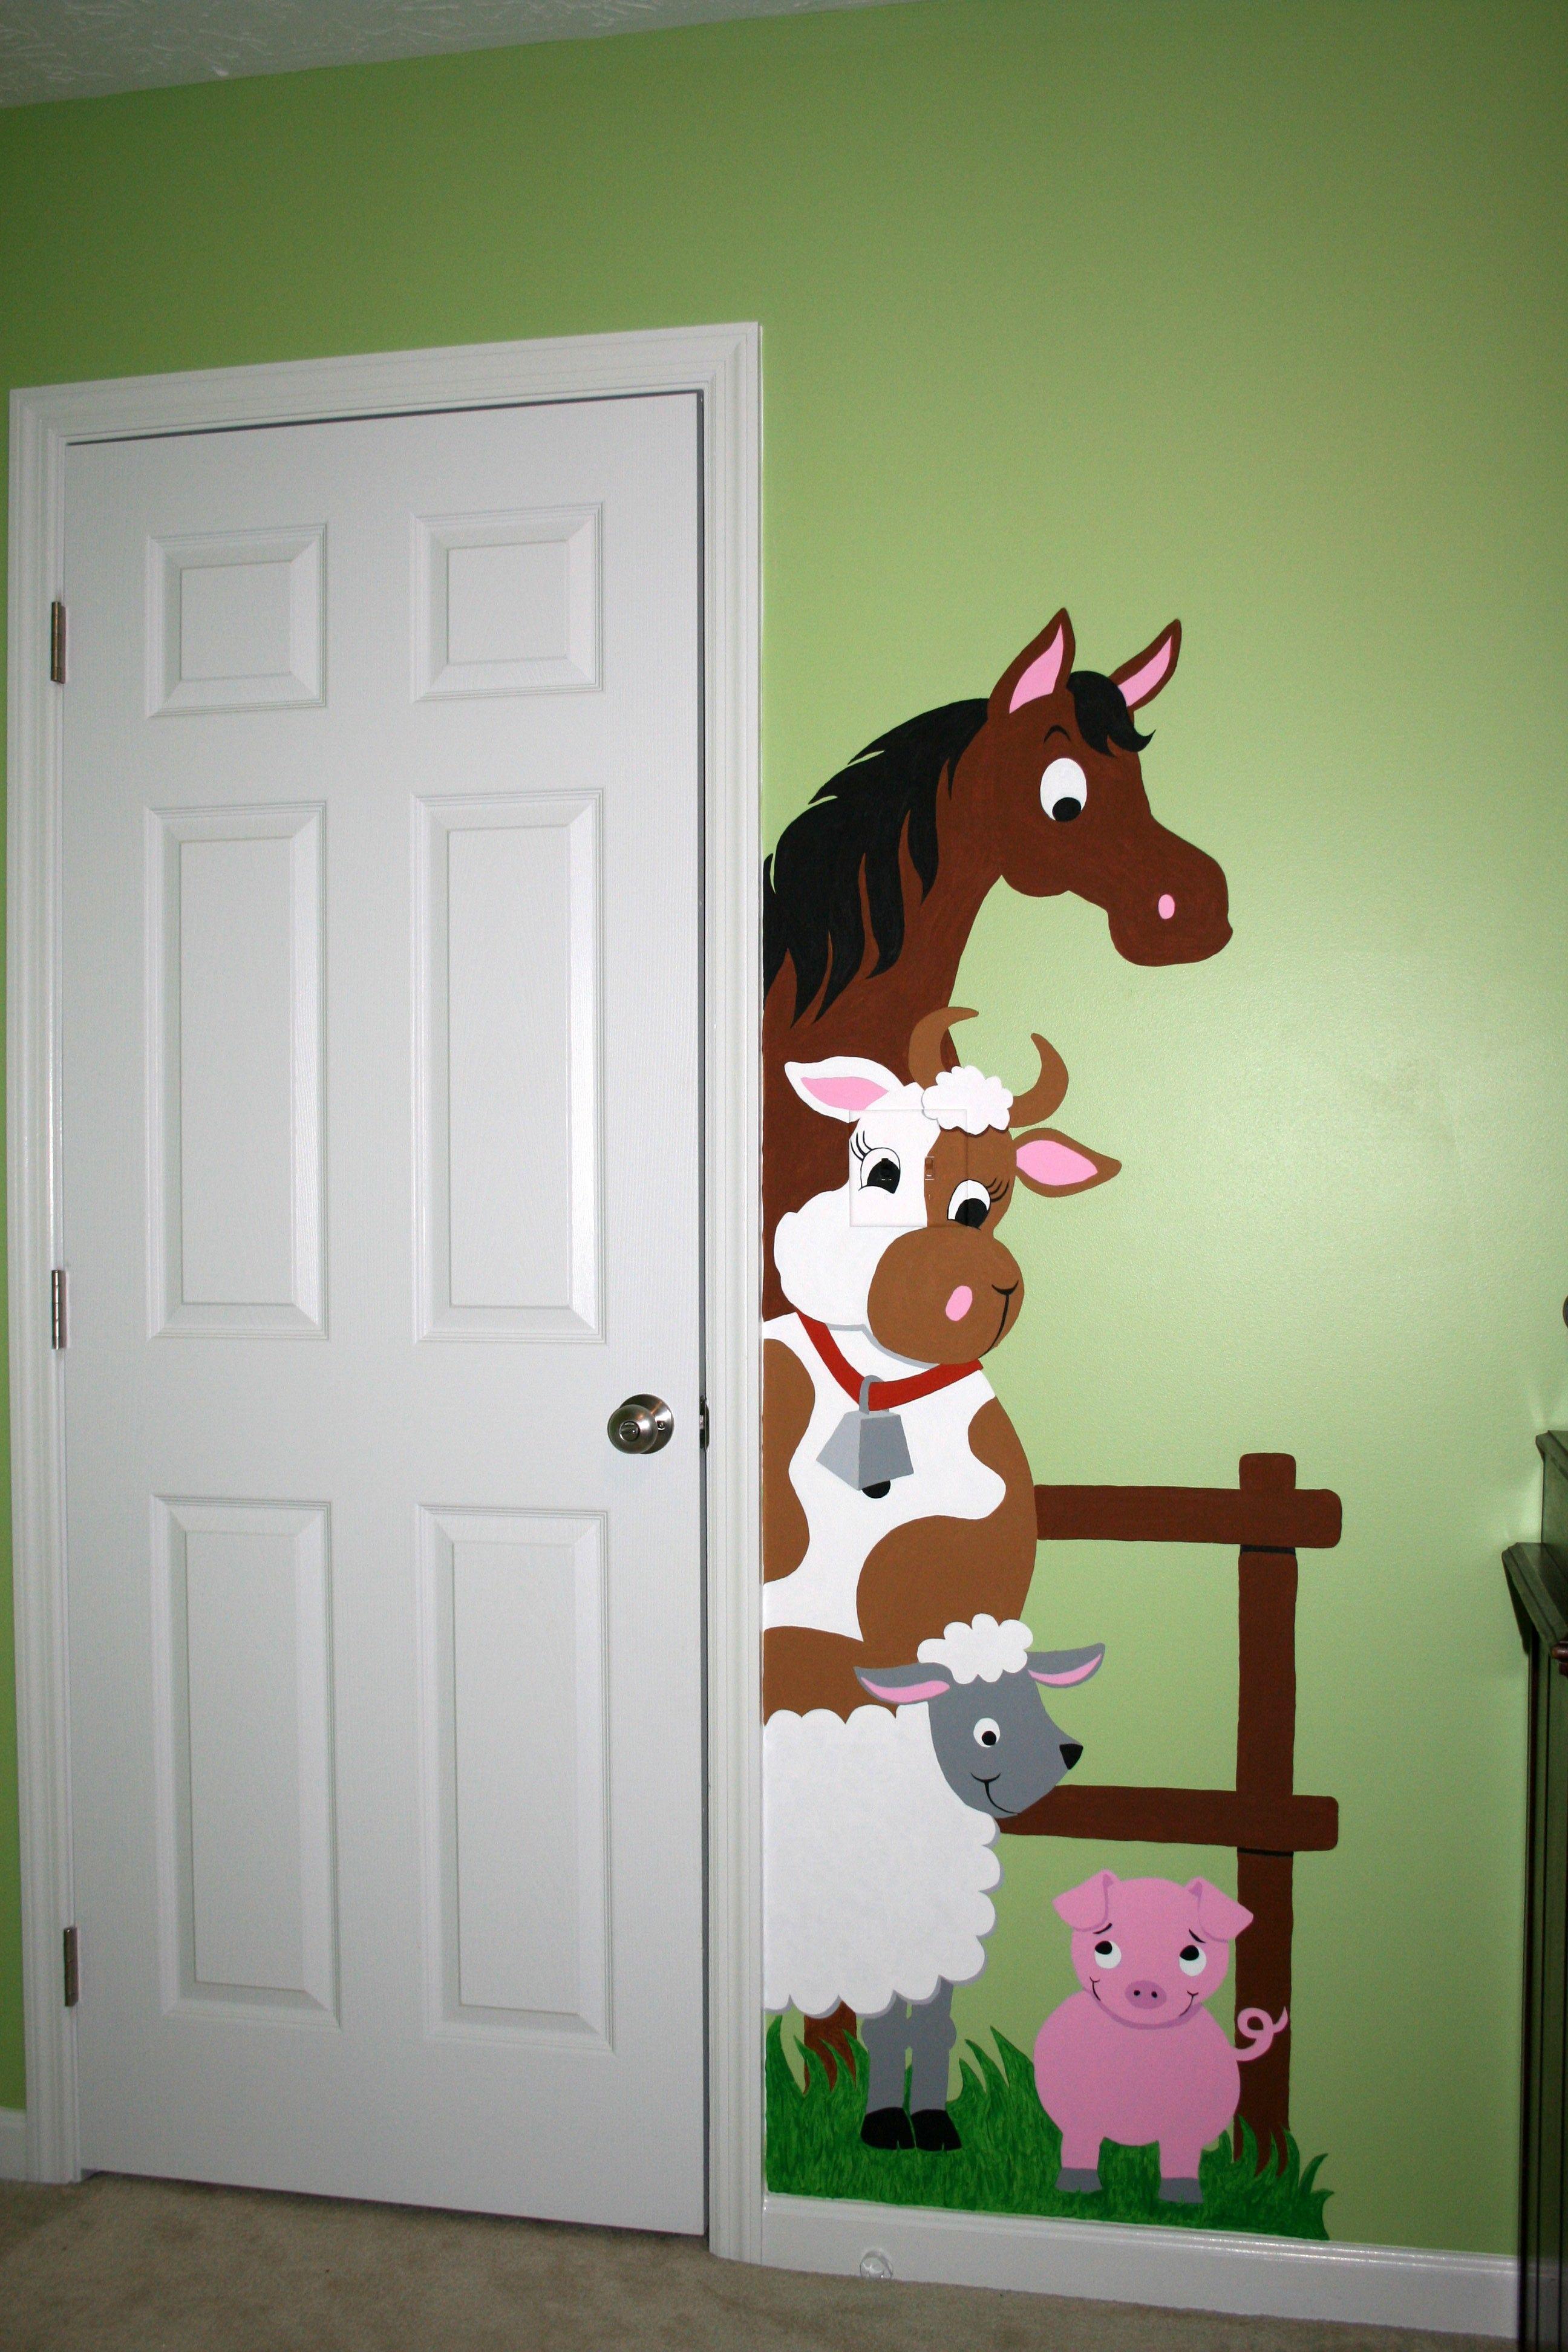 Barnyard Doorhugger Paint-by-Number Wall Mural | Wall murals, Small ...